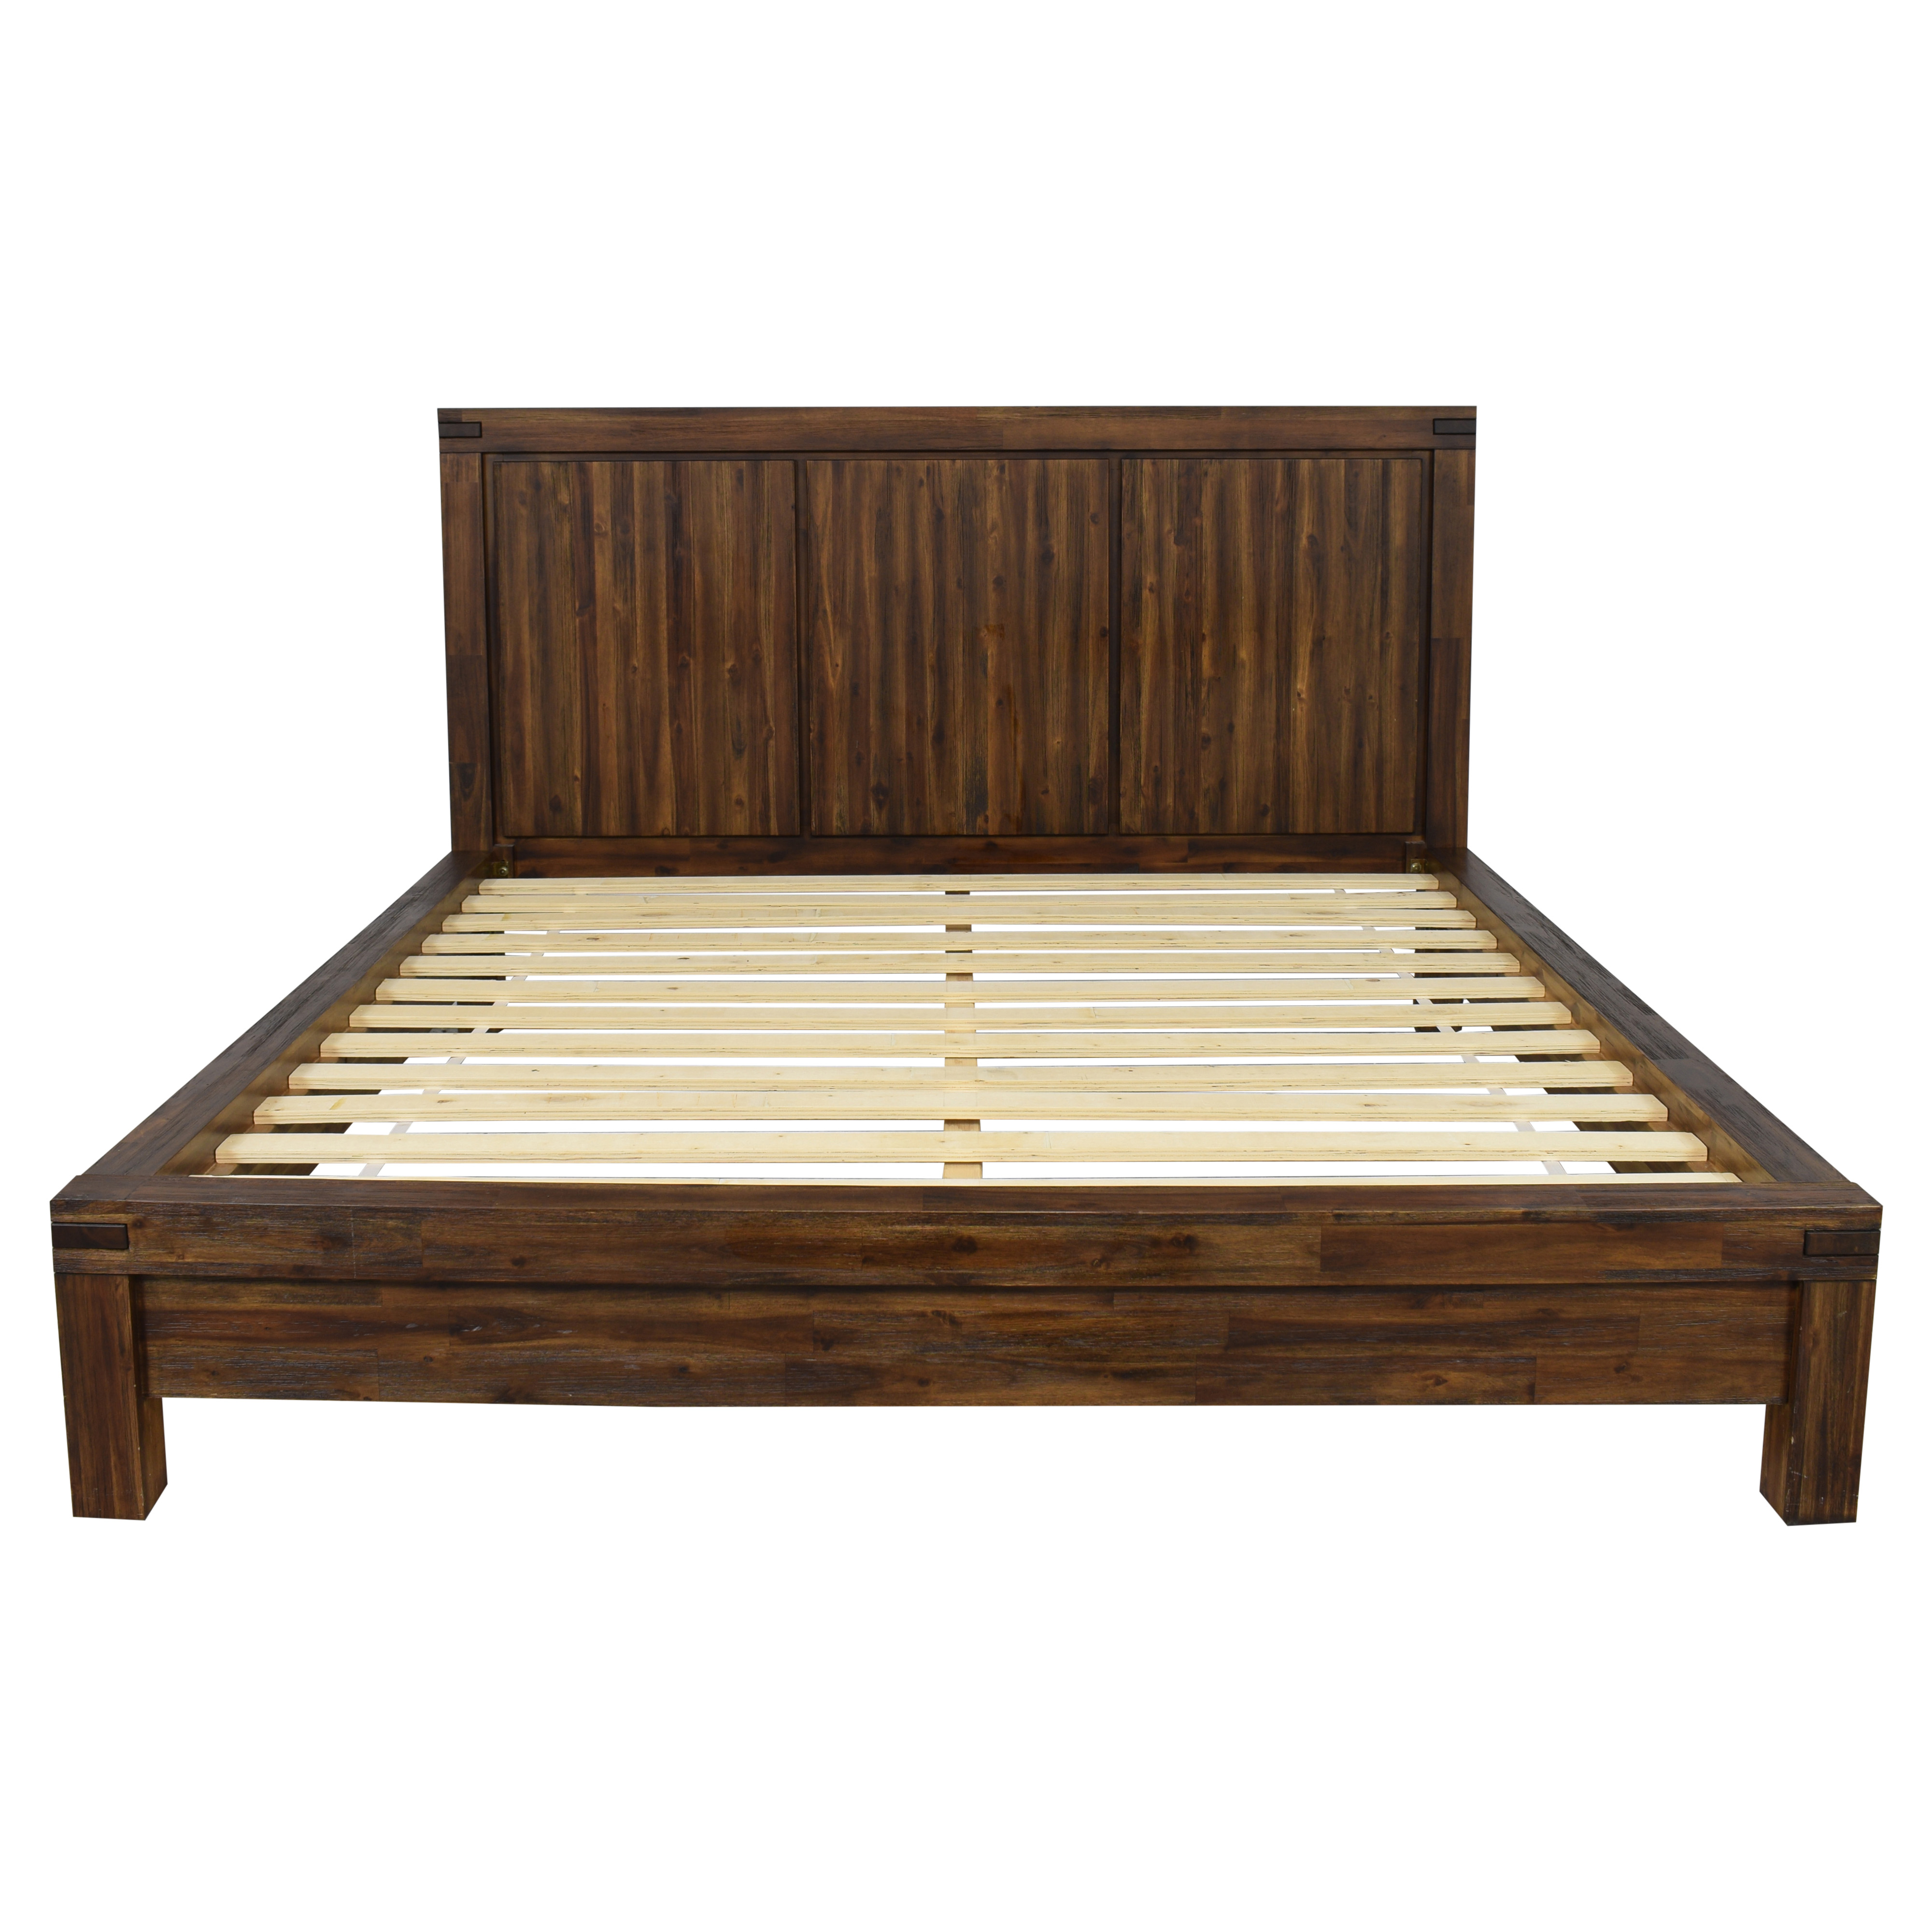 Macy's Avondale King Platform Bed / Beds